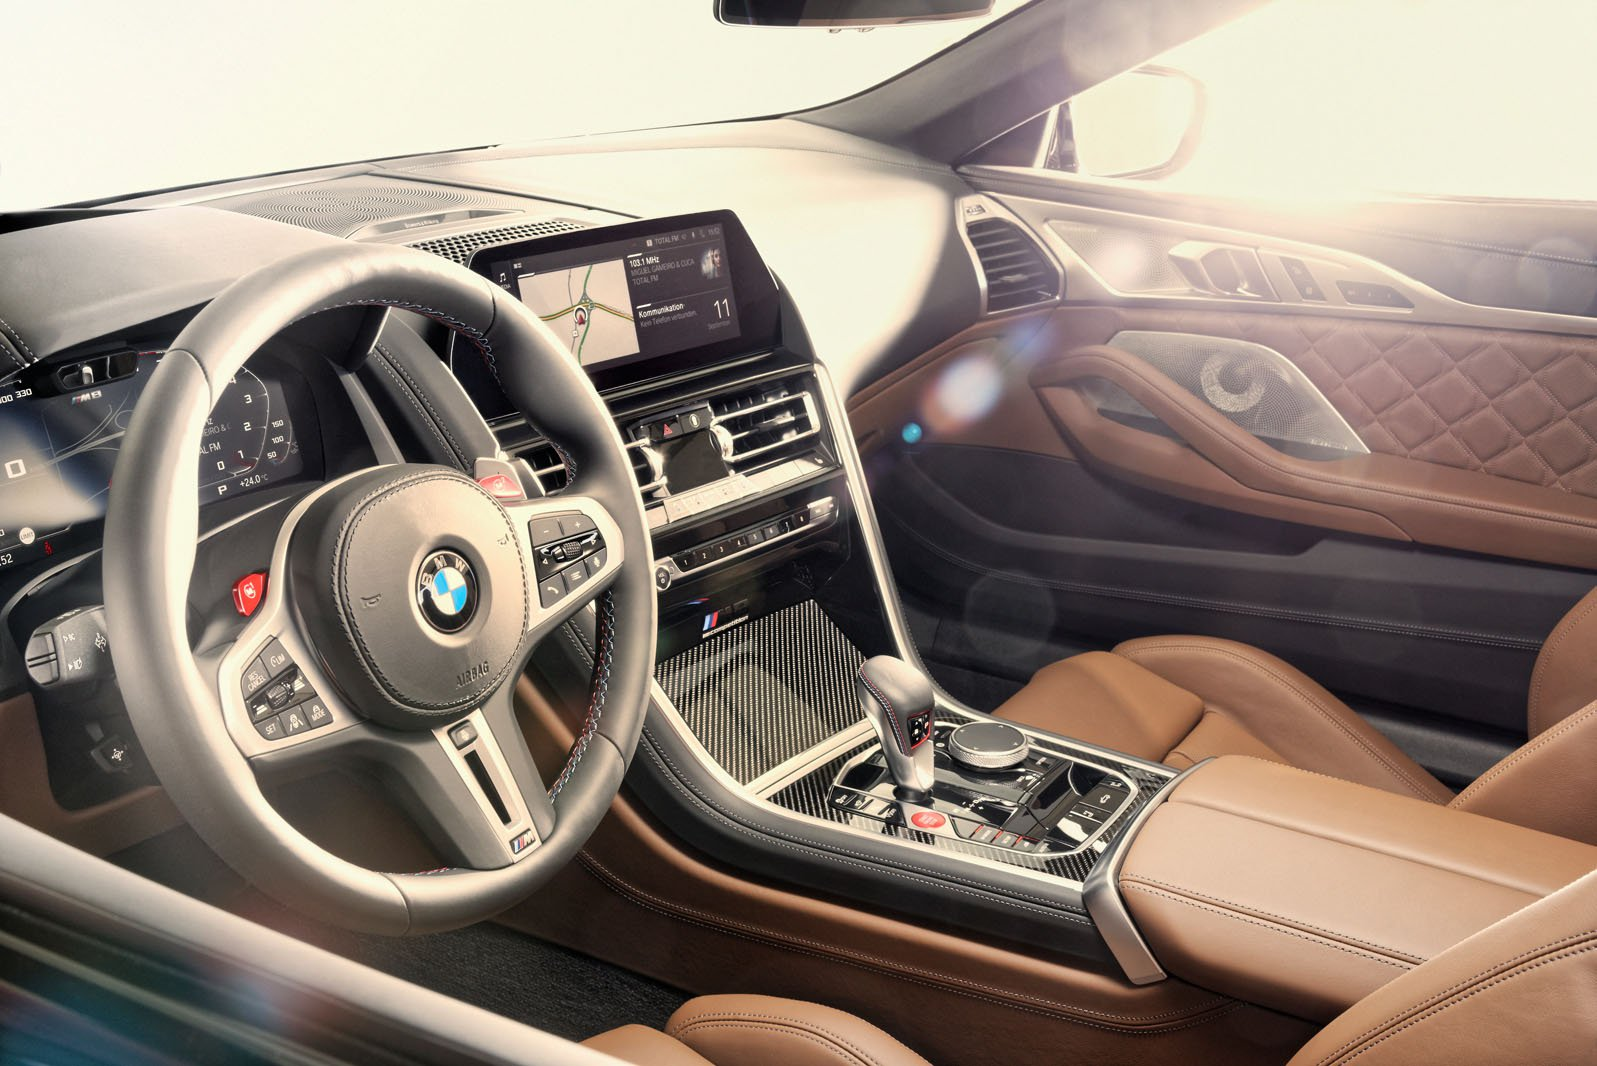 BMW M8 Convertible 2019 LHD dashboard